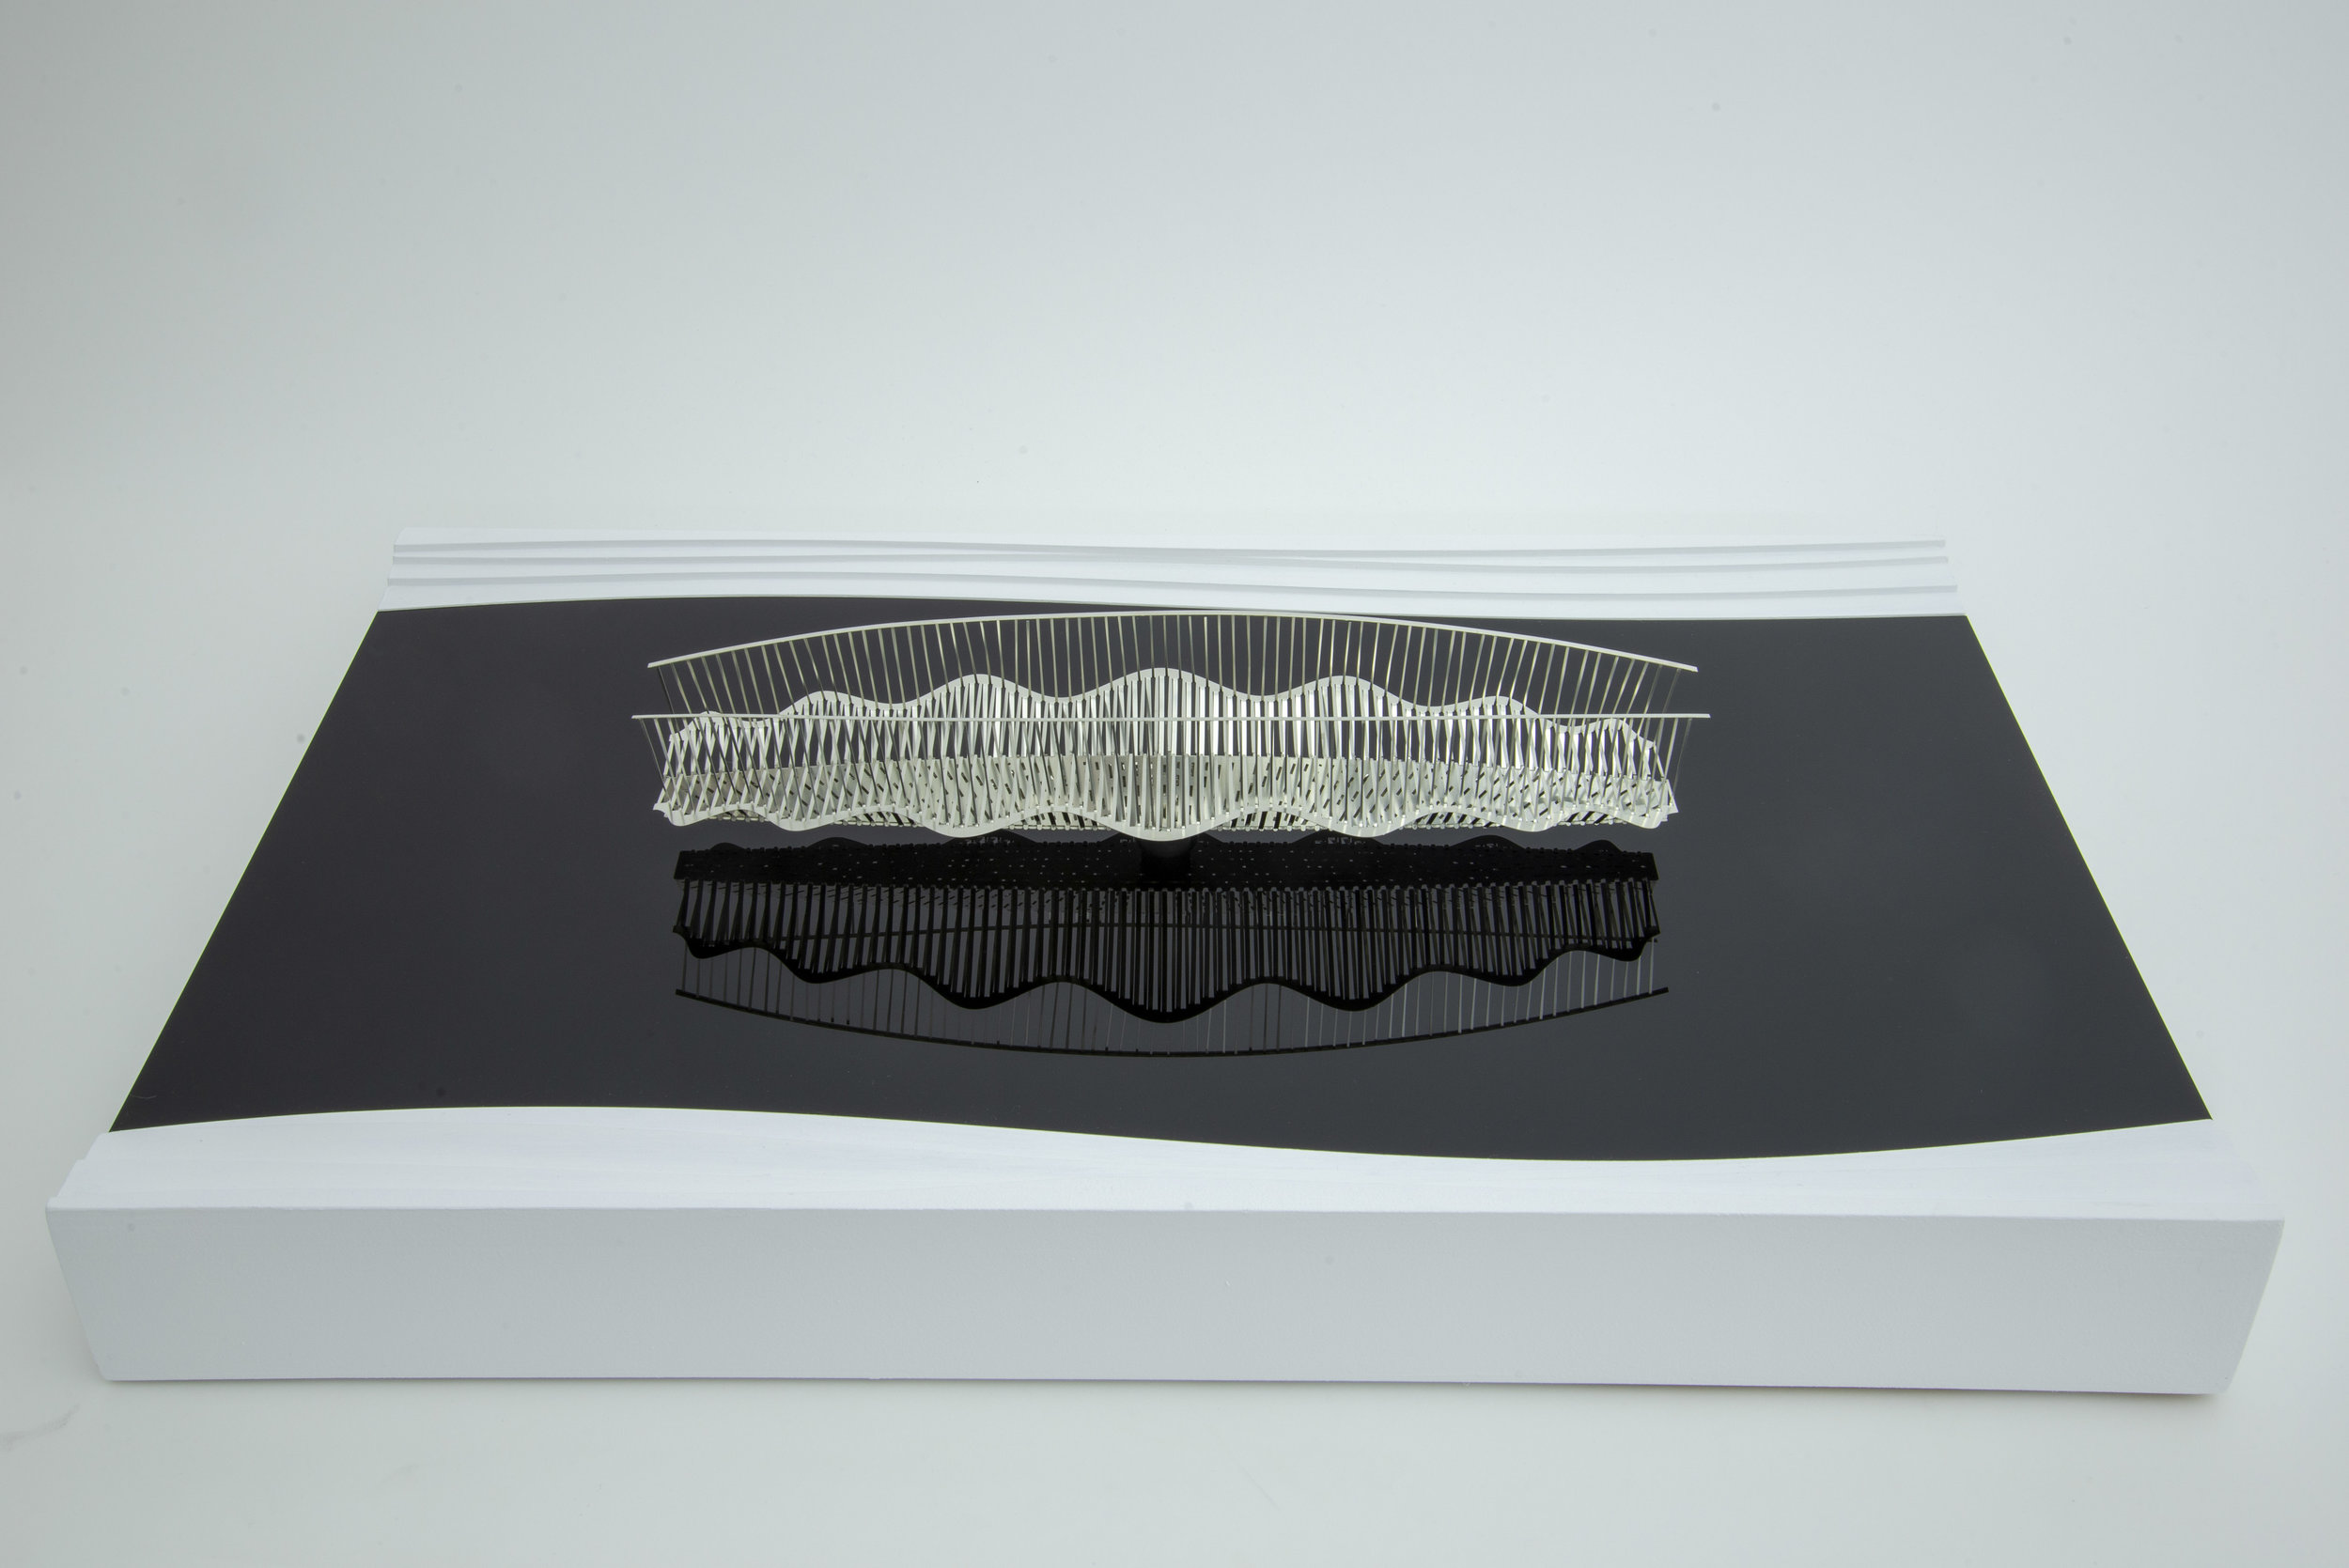 Dinosaur_Bridge_Model_Tonkin_Liu_Royal_Academy_Summer_Exhibition